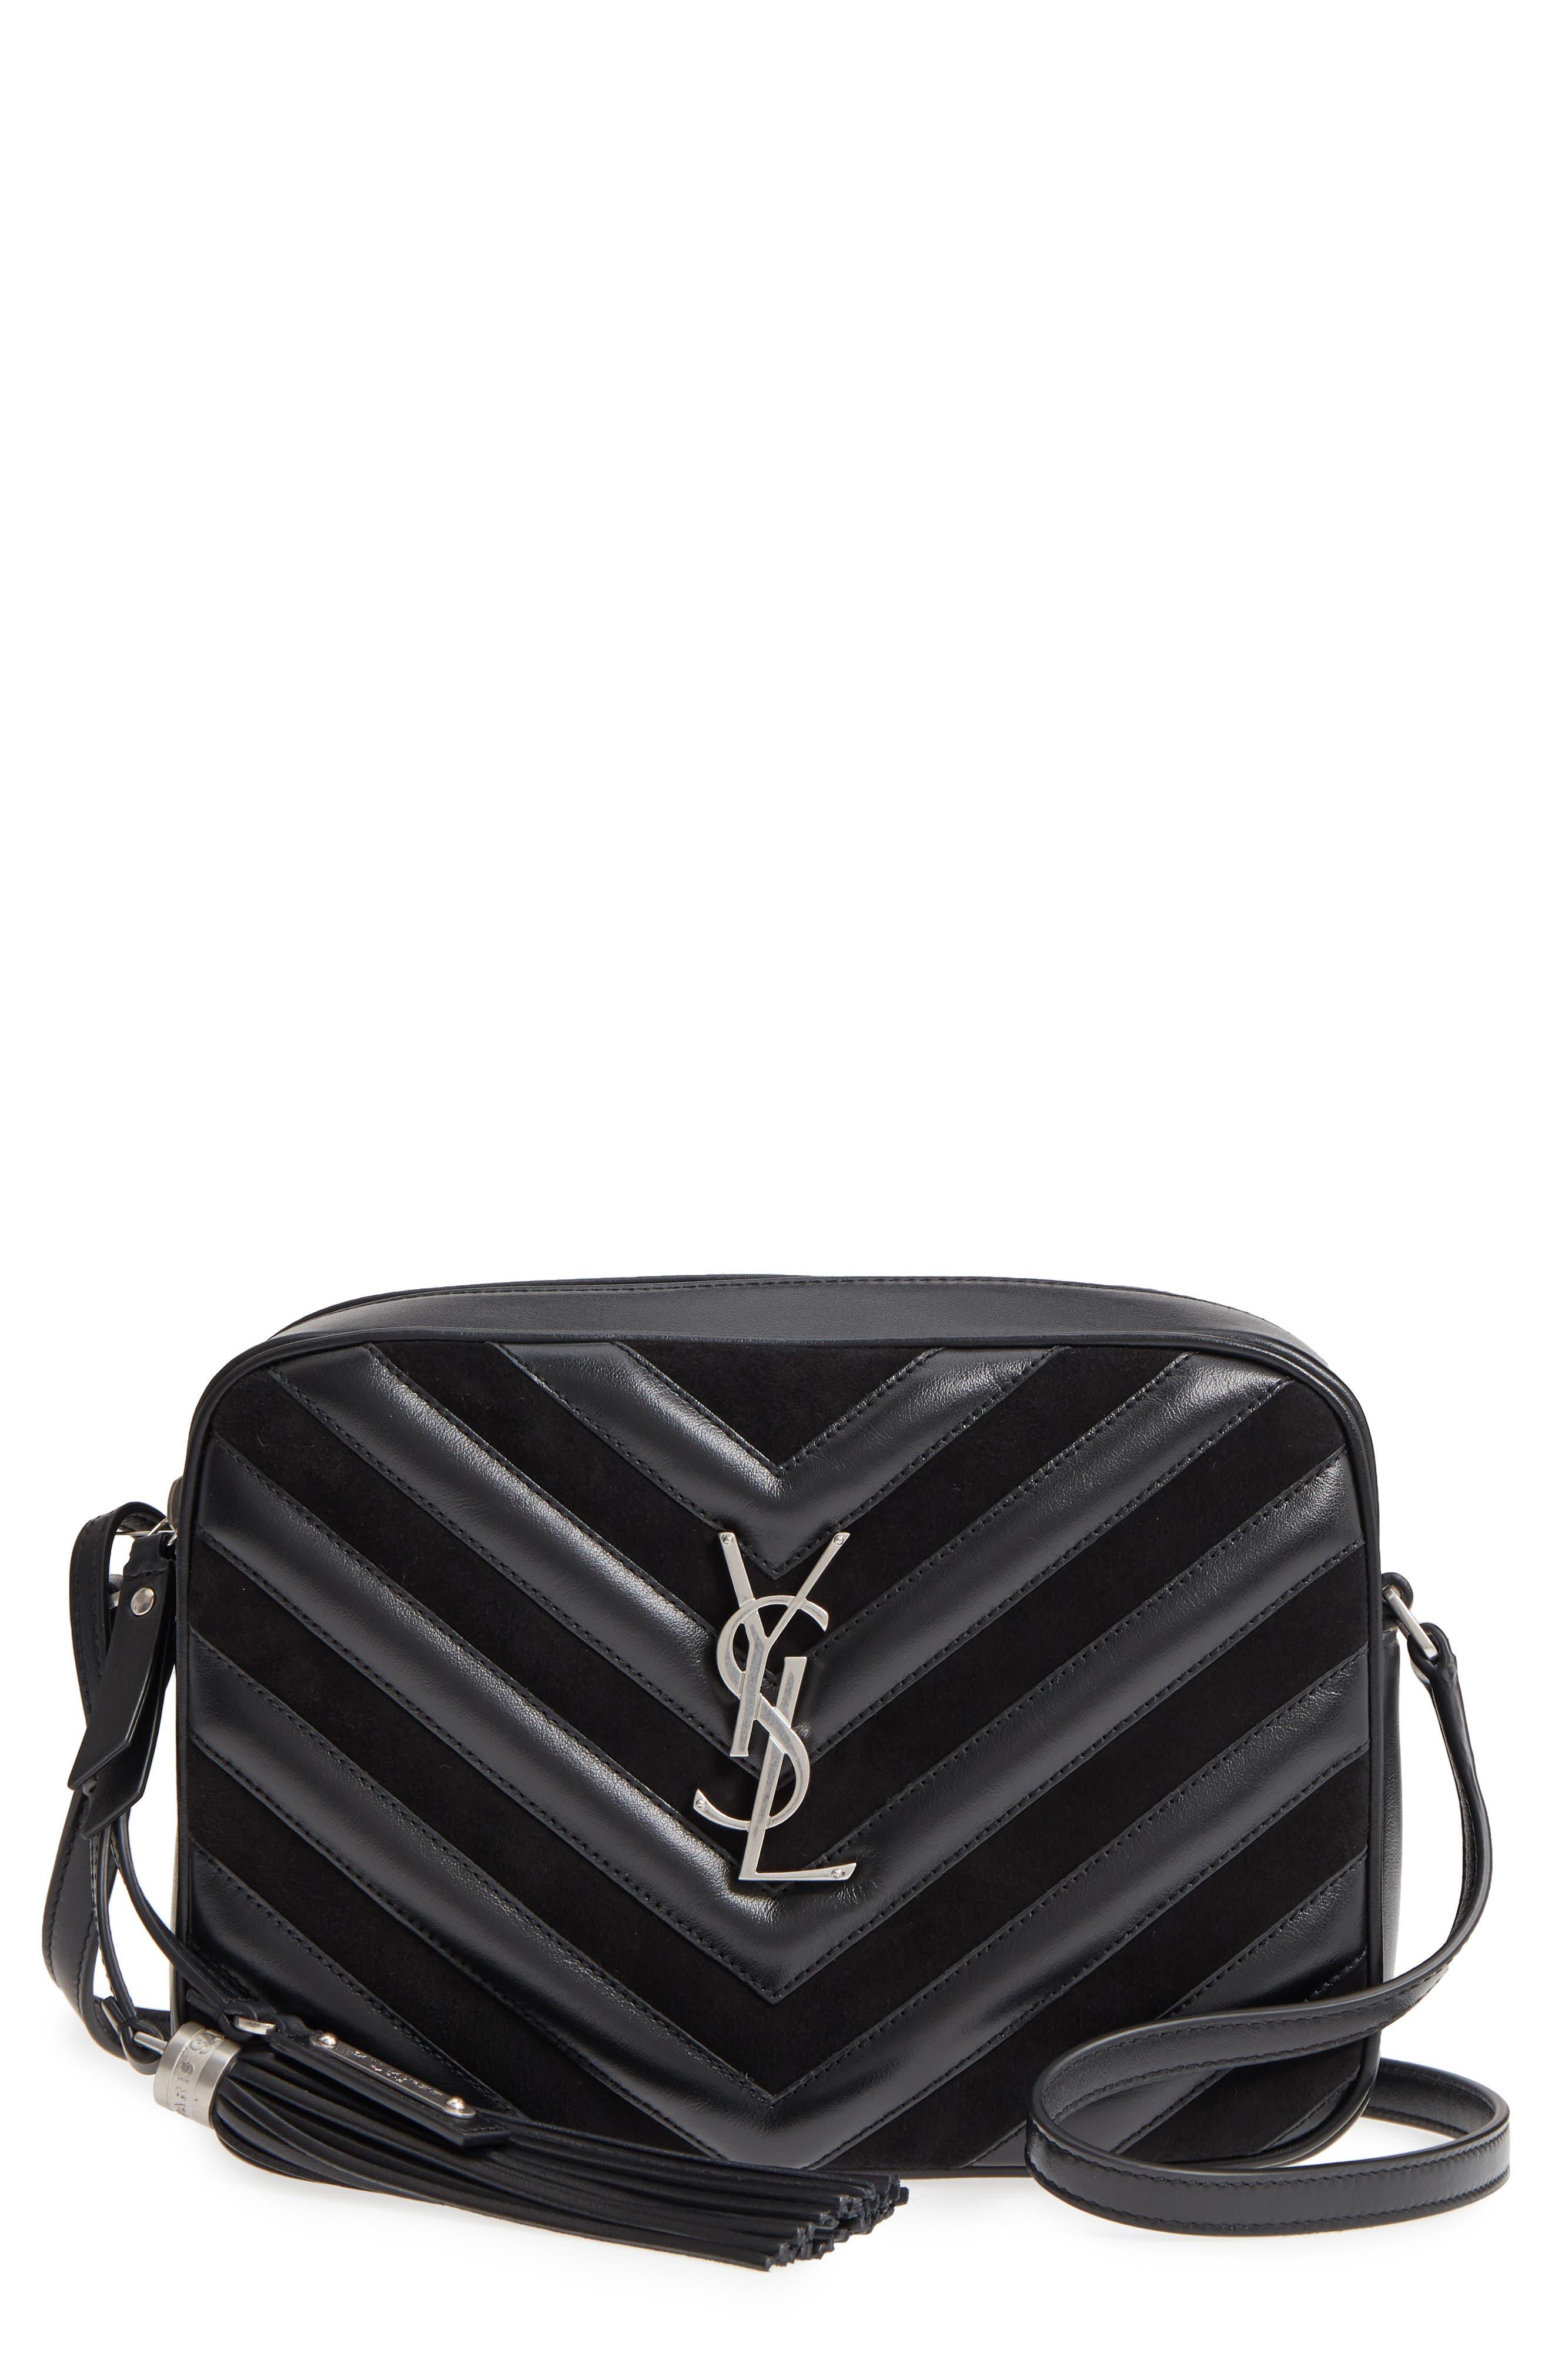 Medium Lou Leather & Suede Camera Bag,                             Main thumbnail 1, color,                             Noir